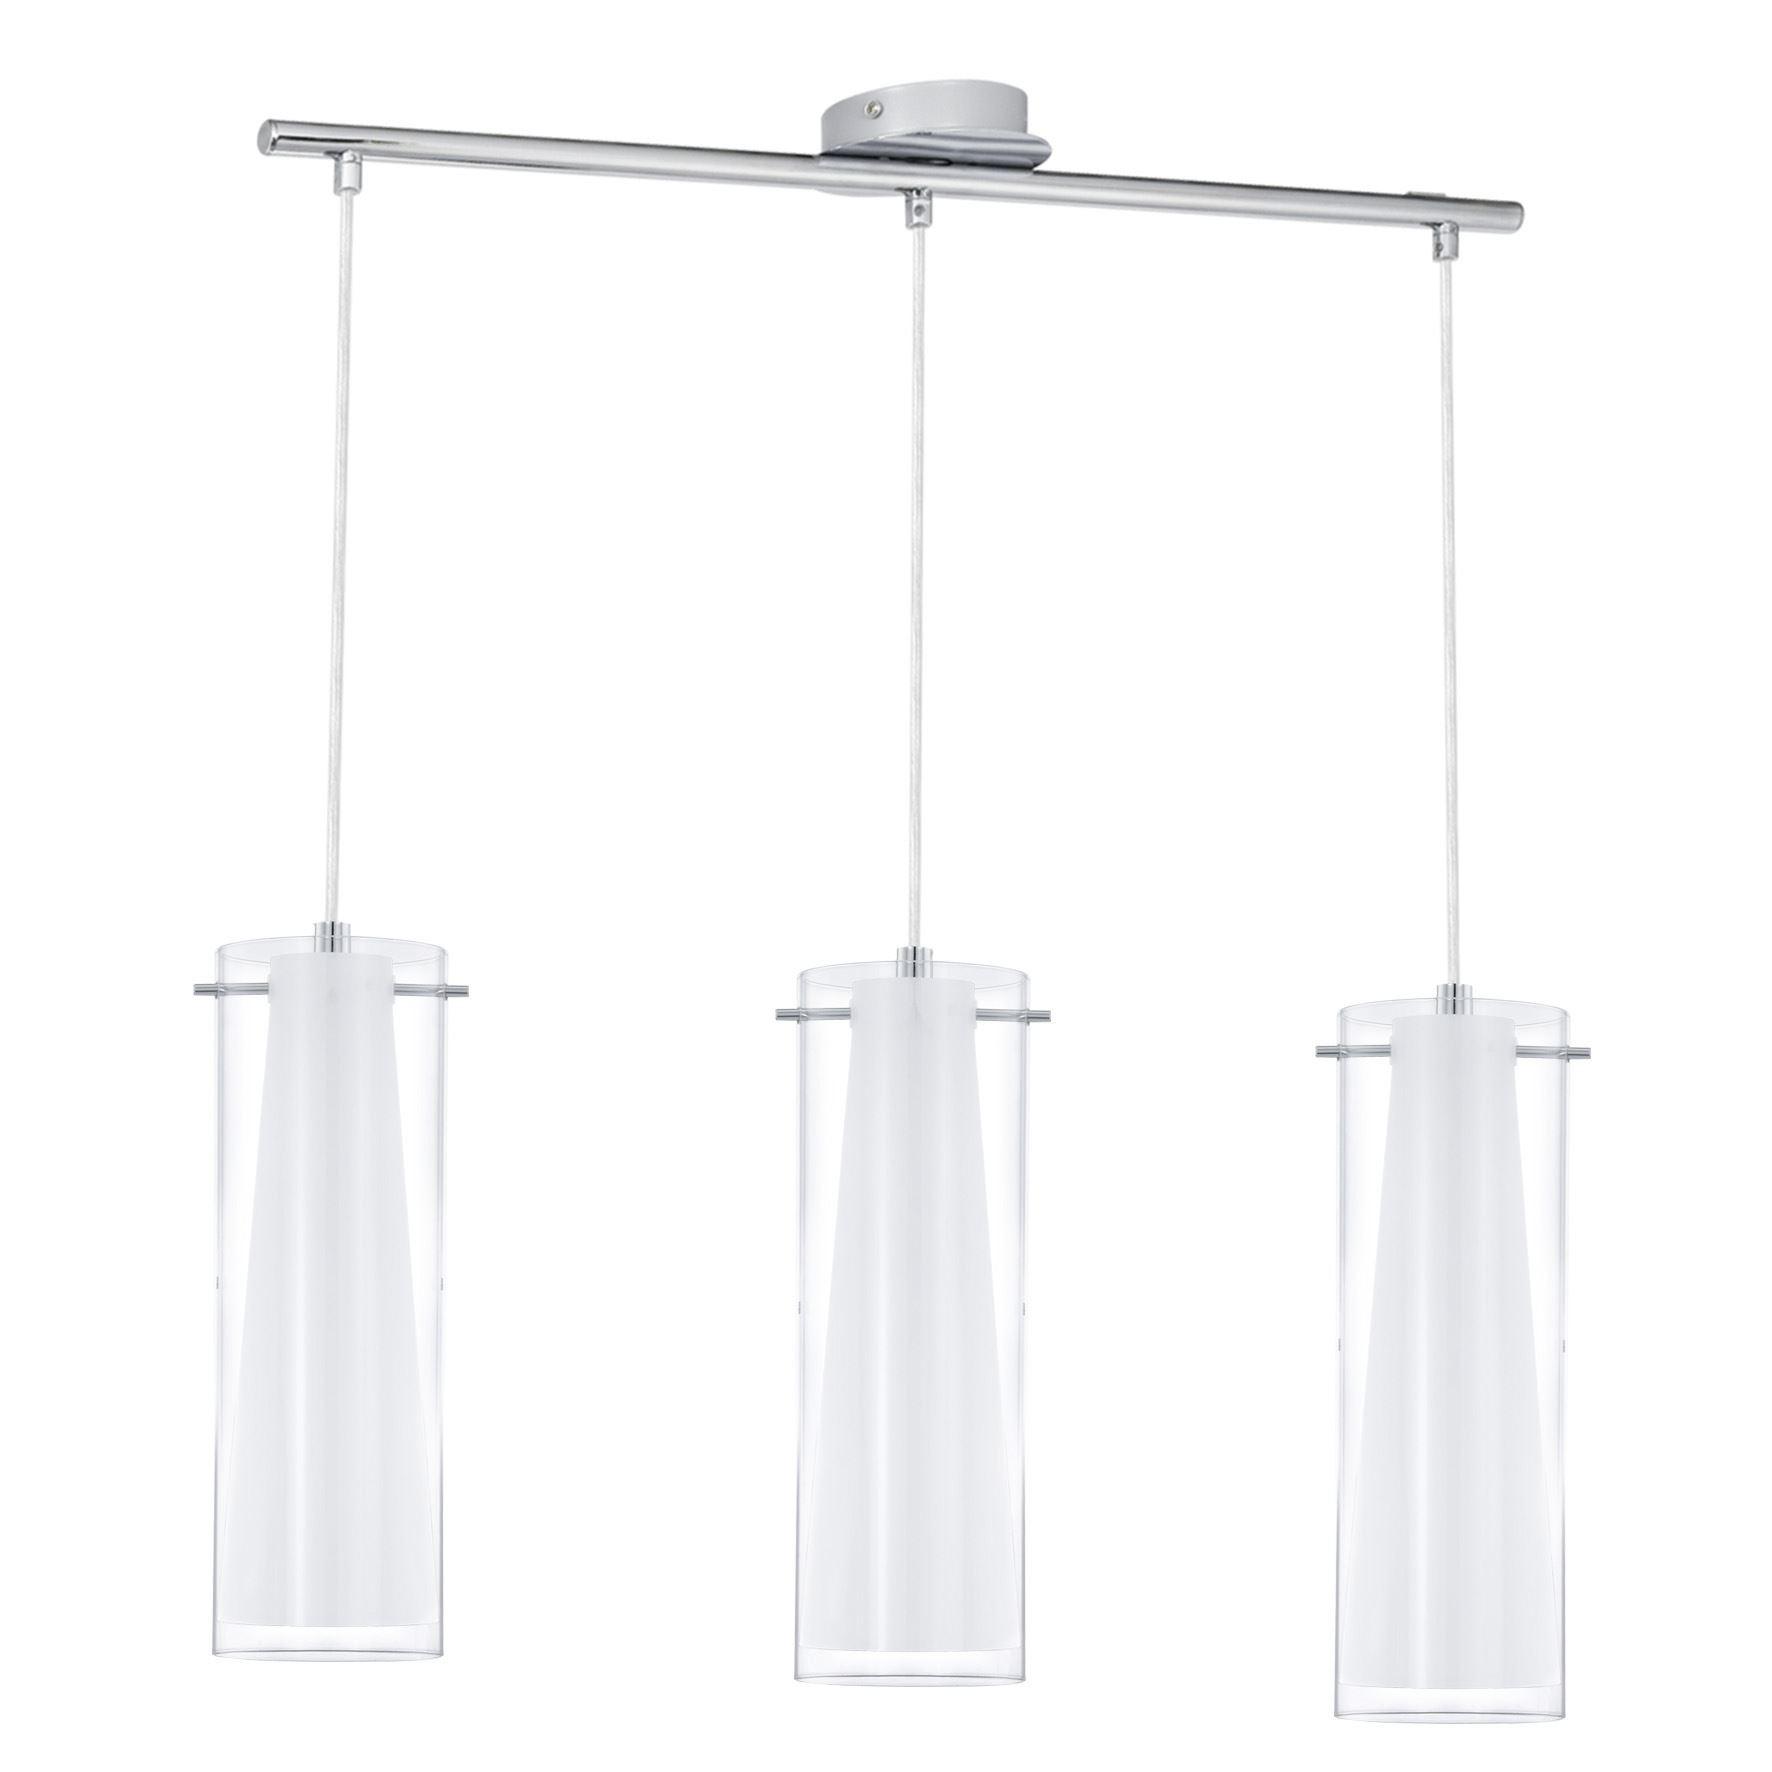 Pendant Lamp Pinto 3 Lights E27 Height 1100 mm Chrome And Glass